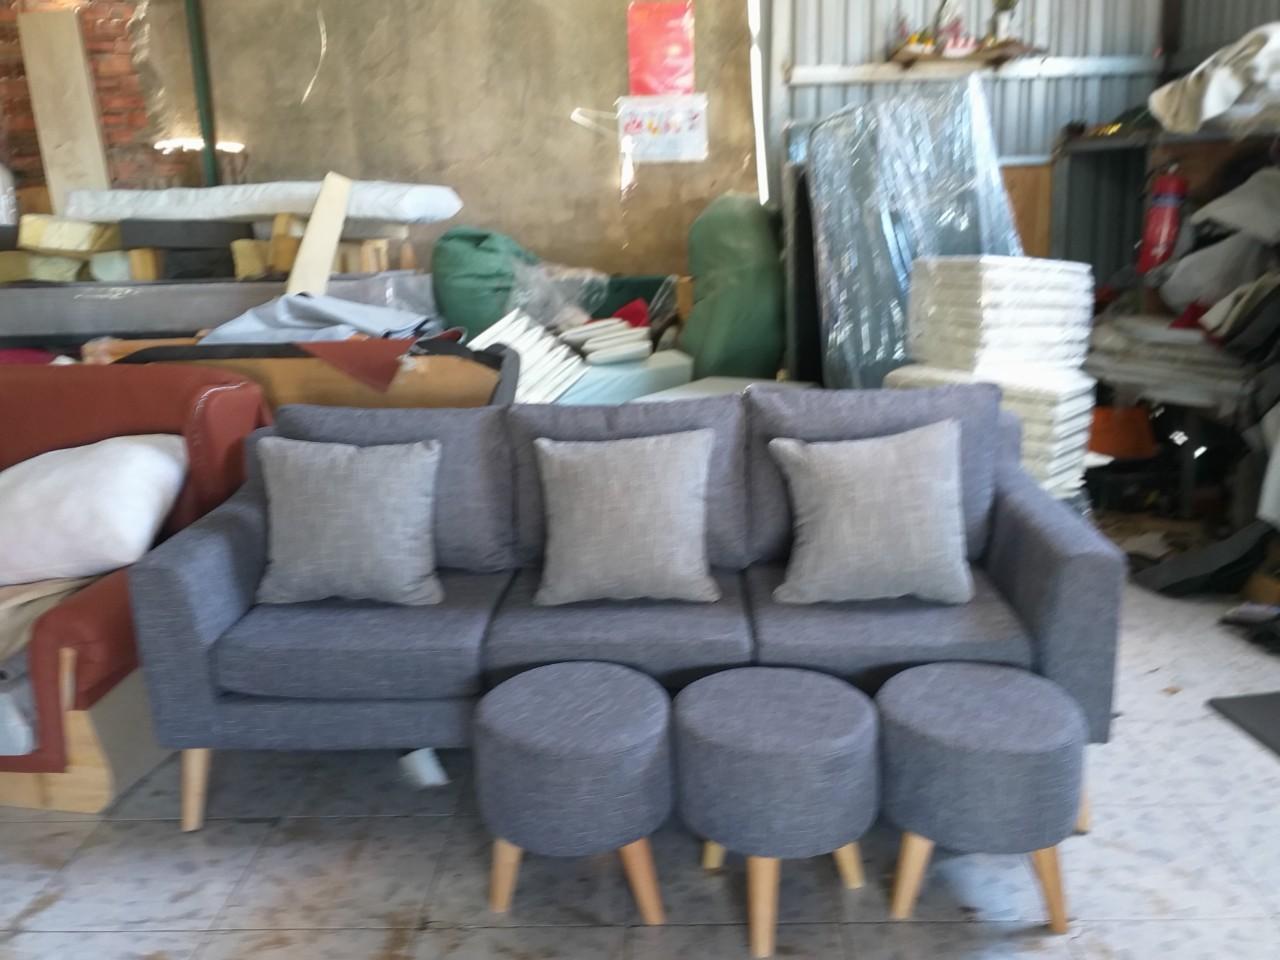 11 Bộ sofa gồm 4 món giá 3.500k